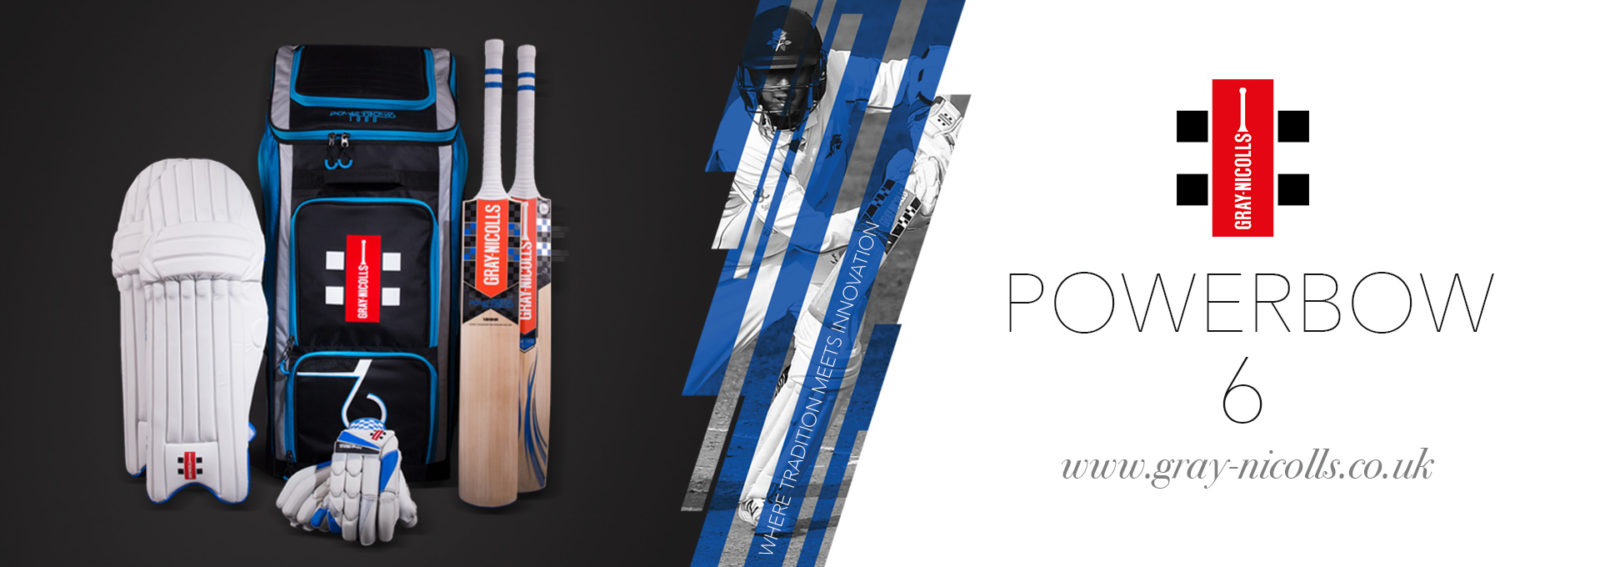 VK Sports 1920x680 Powerbow6